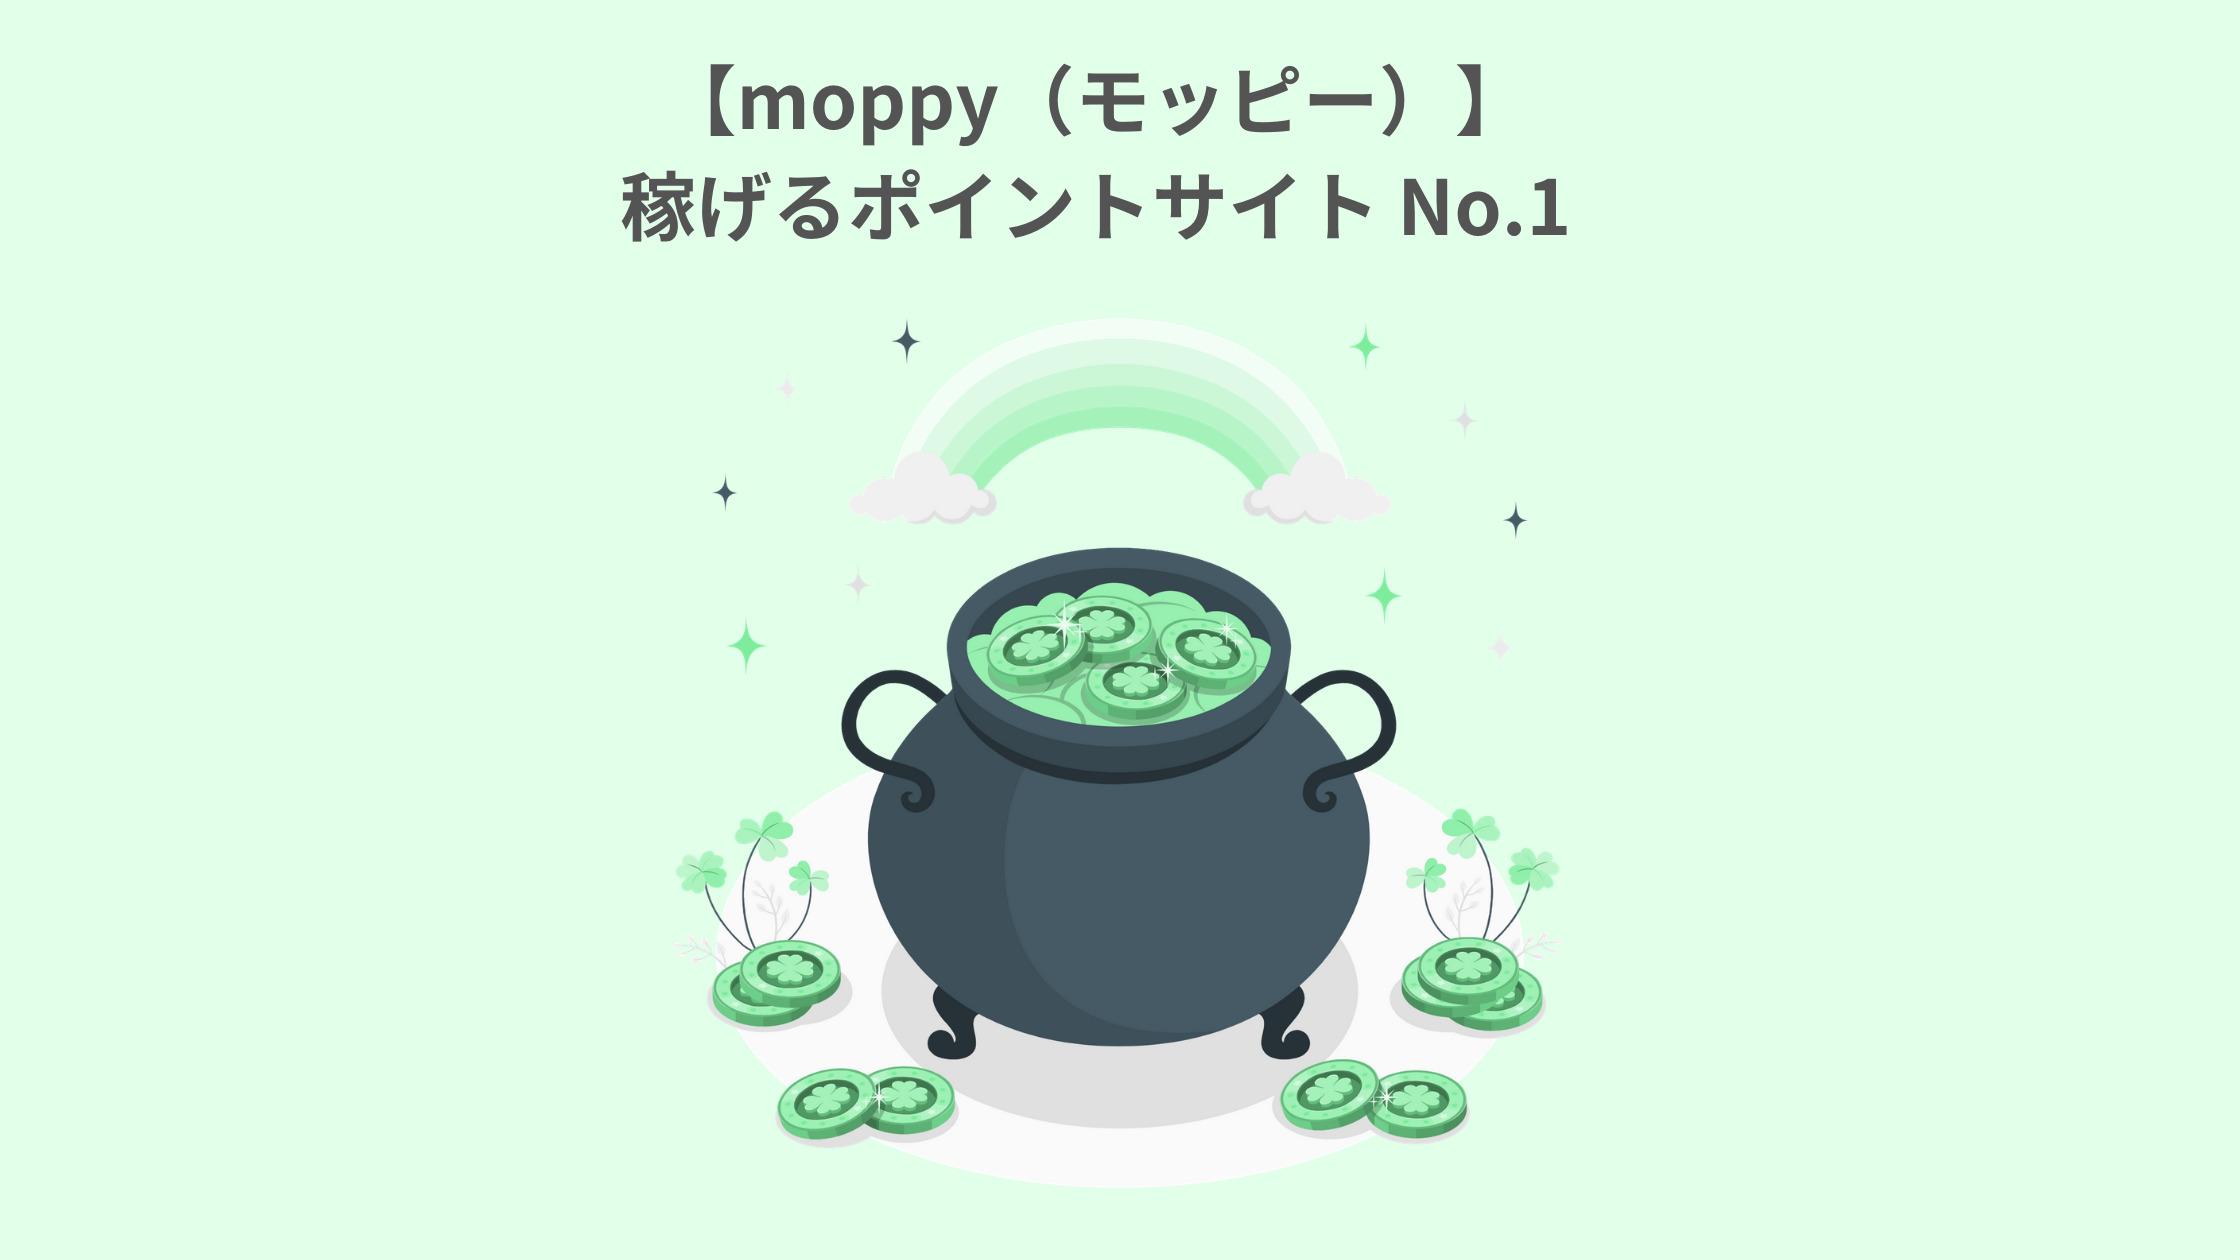 【moppy(モッピー)】 稼げるポイントサイト No.1